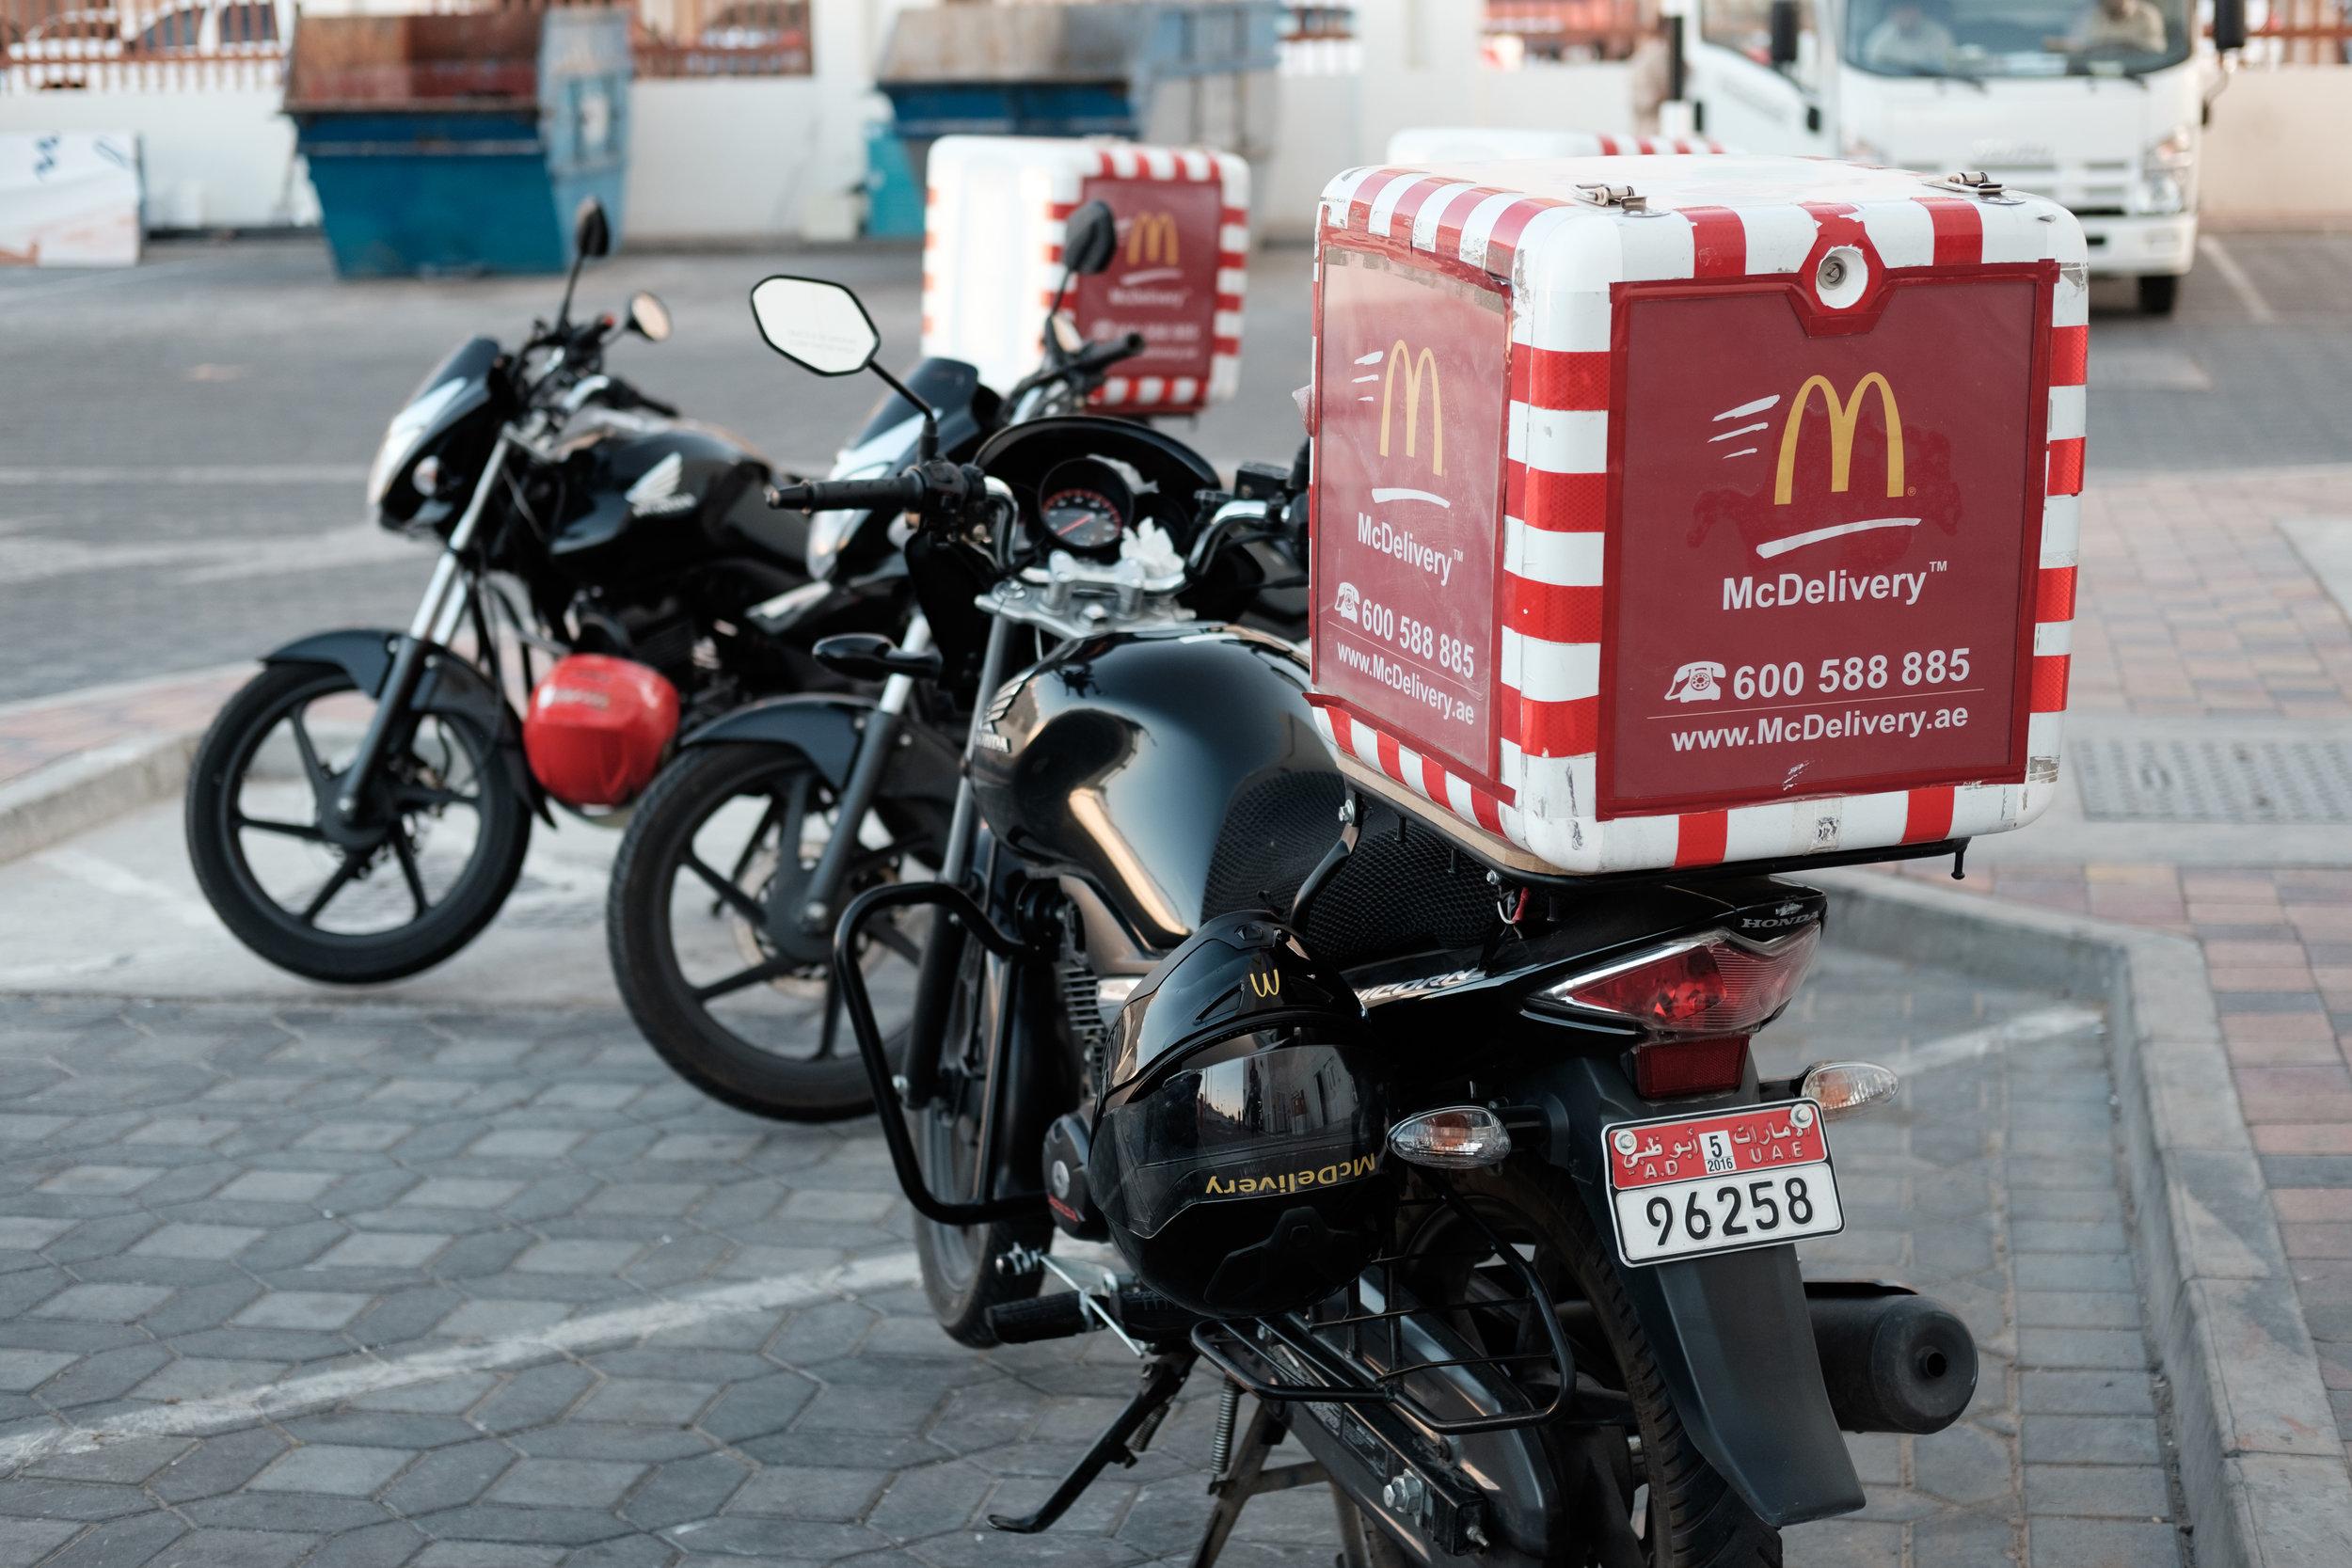 McDonalds Delivery Al Ain